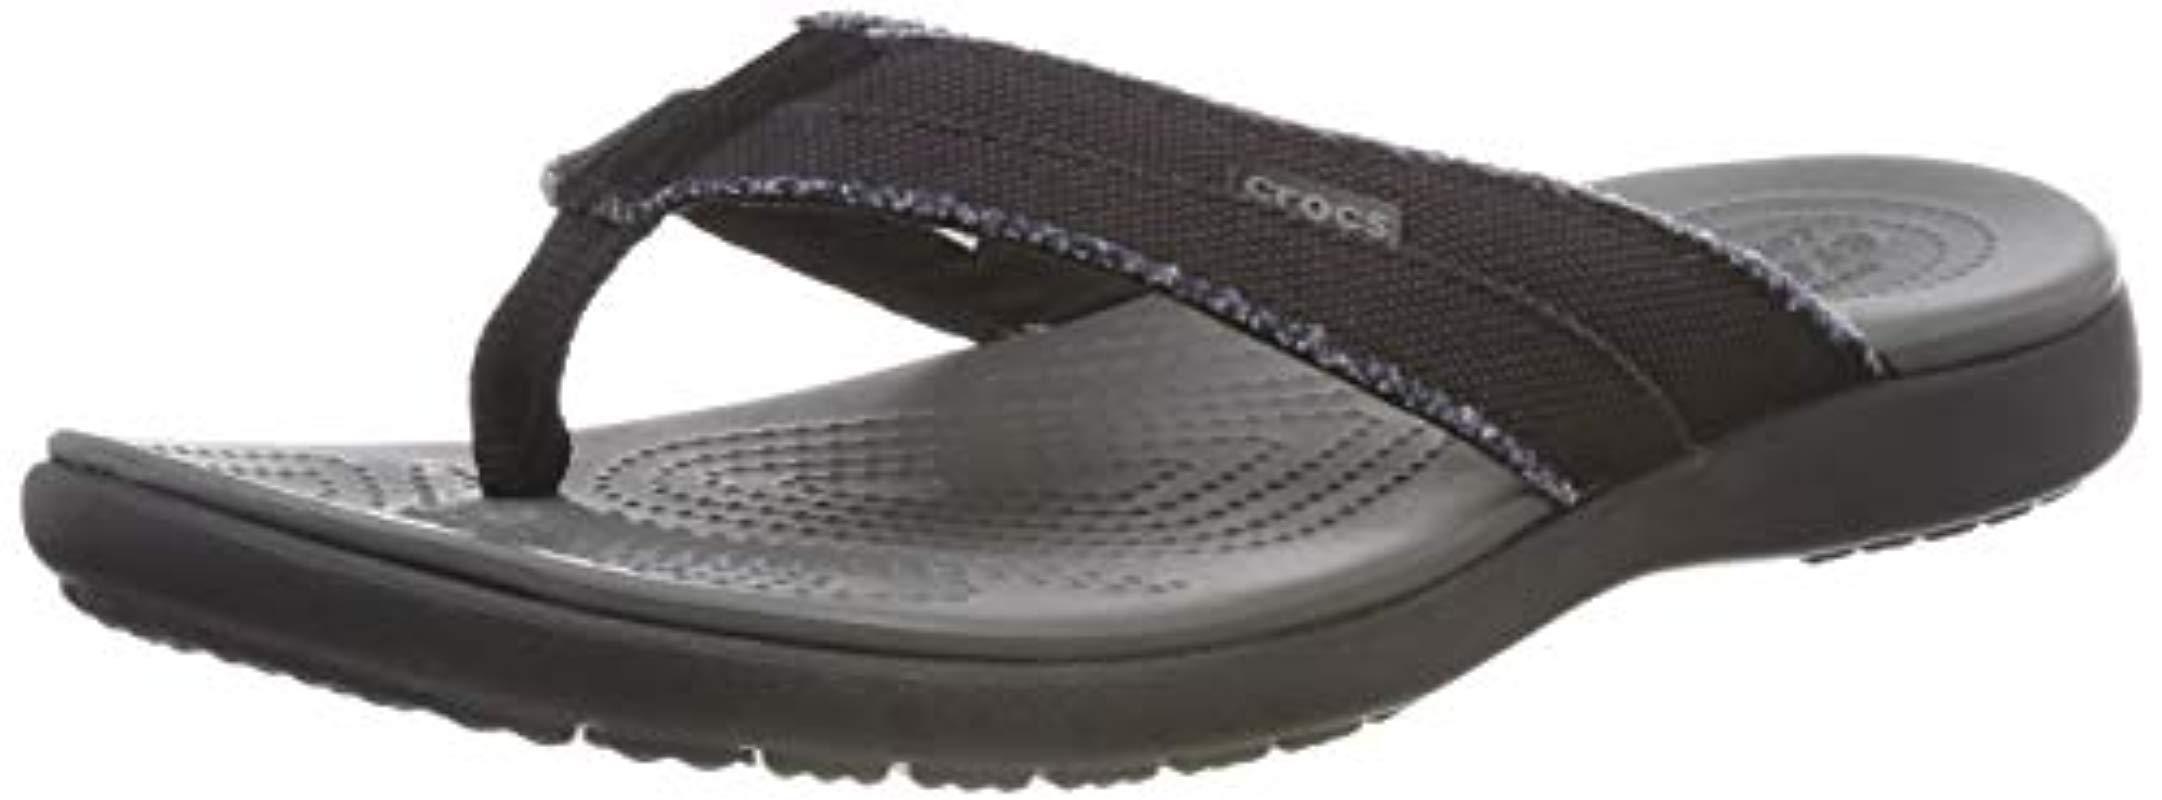 26ac4b07d51c Lyst - Crocs™ Santa Cruz Canvas Flip Flop in Gray for Men - Save 3%